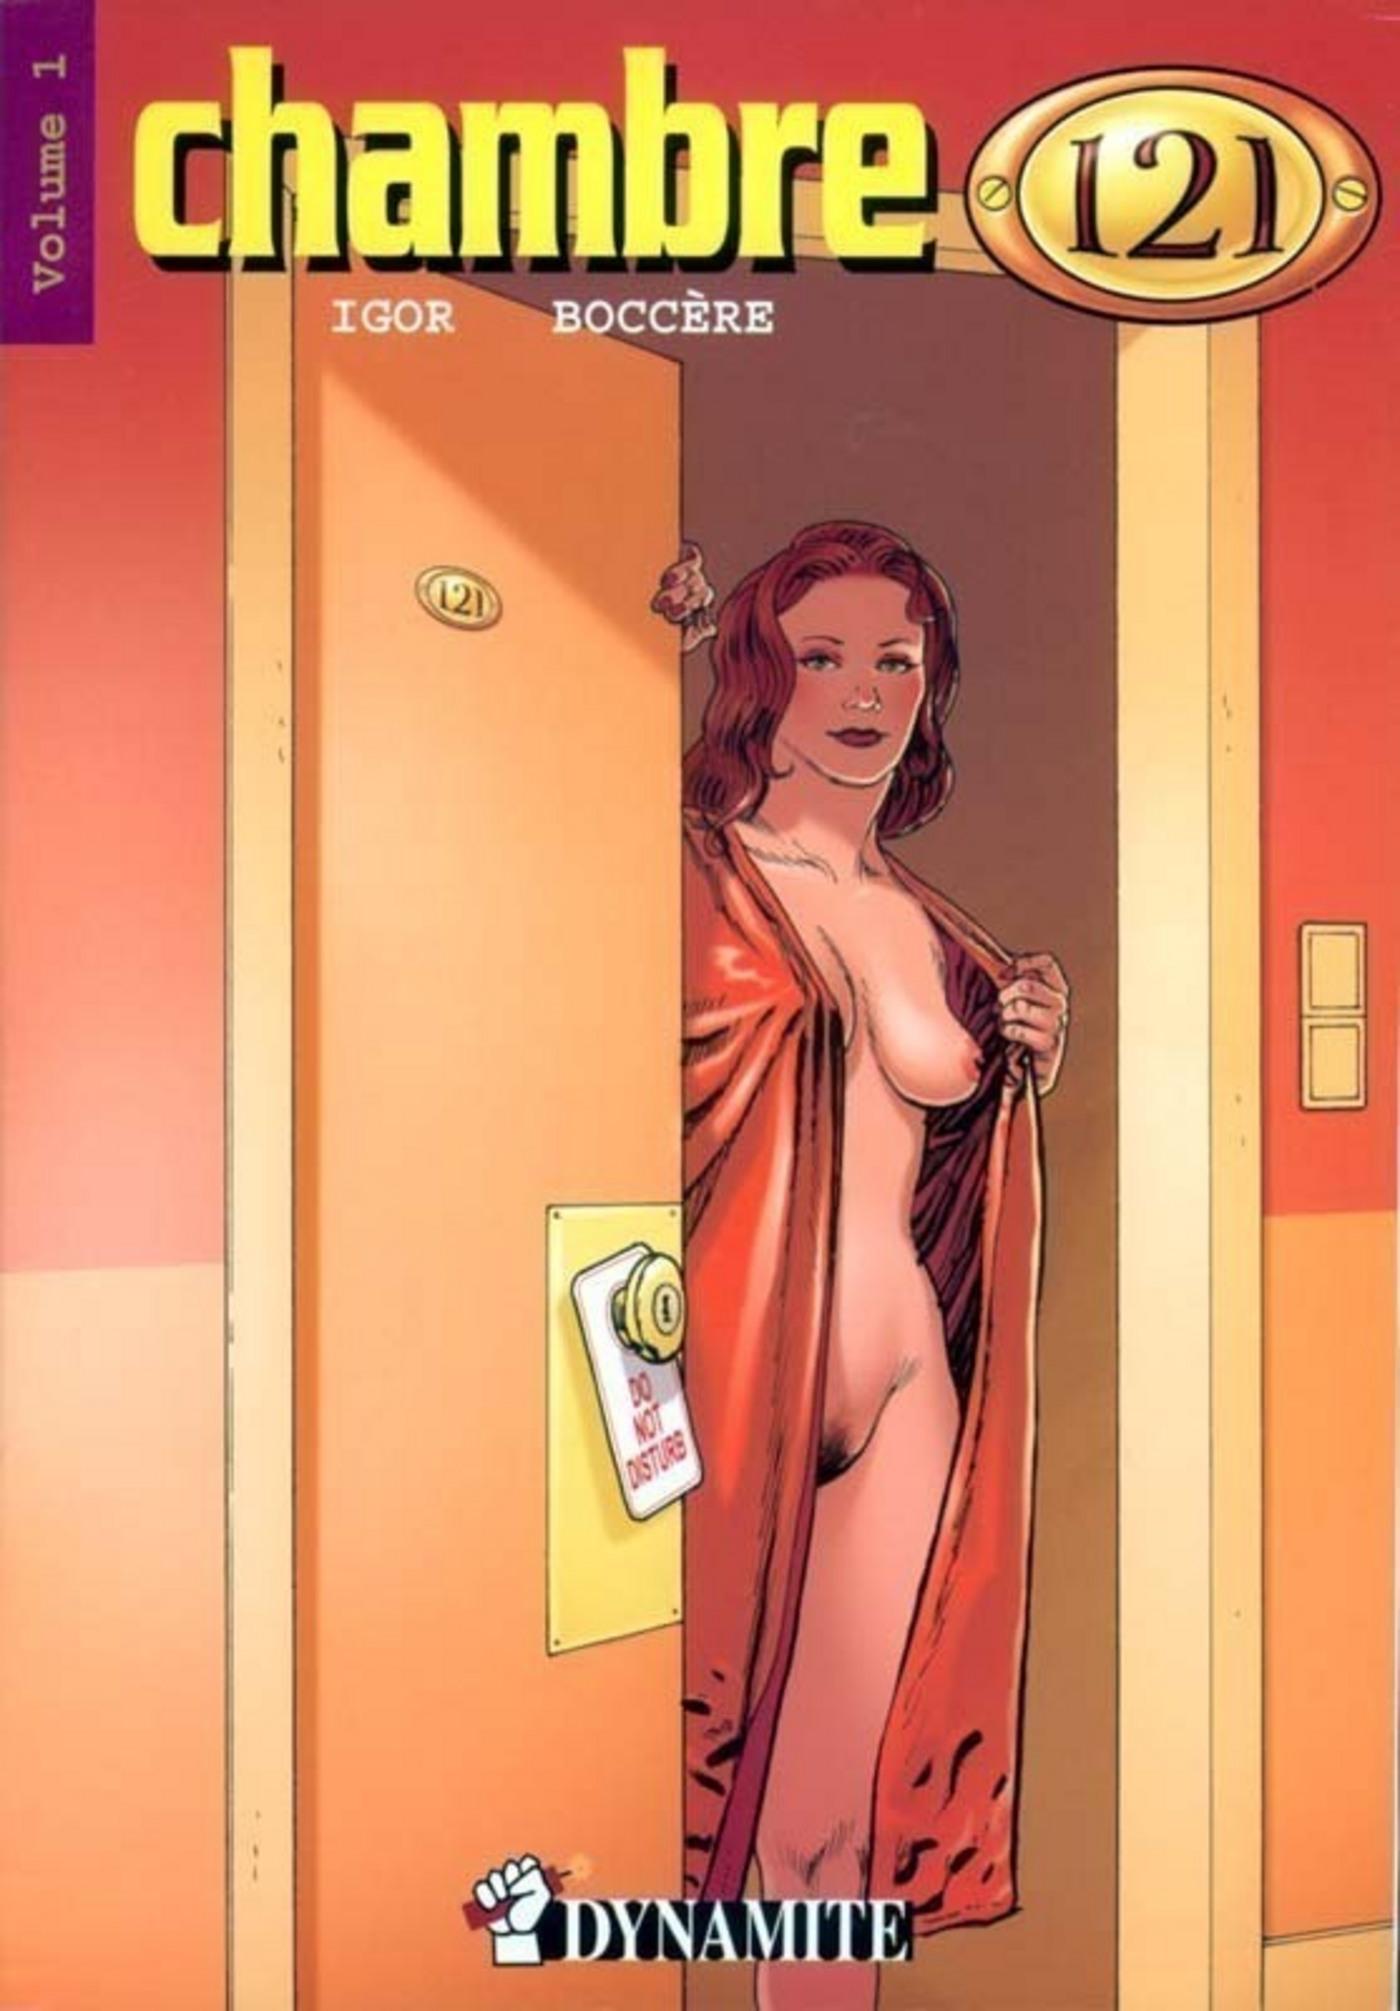 Chambre 121 - volume 1